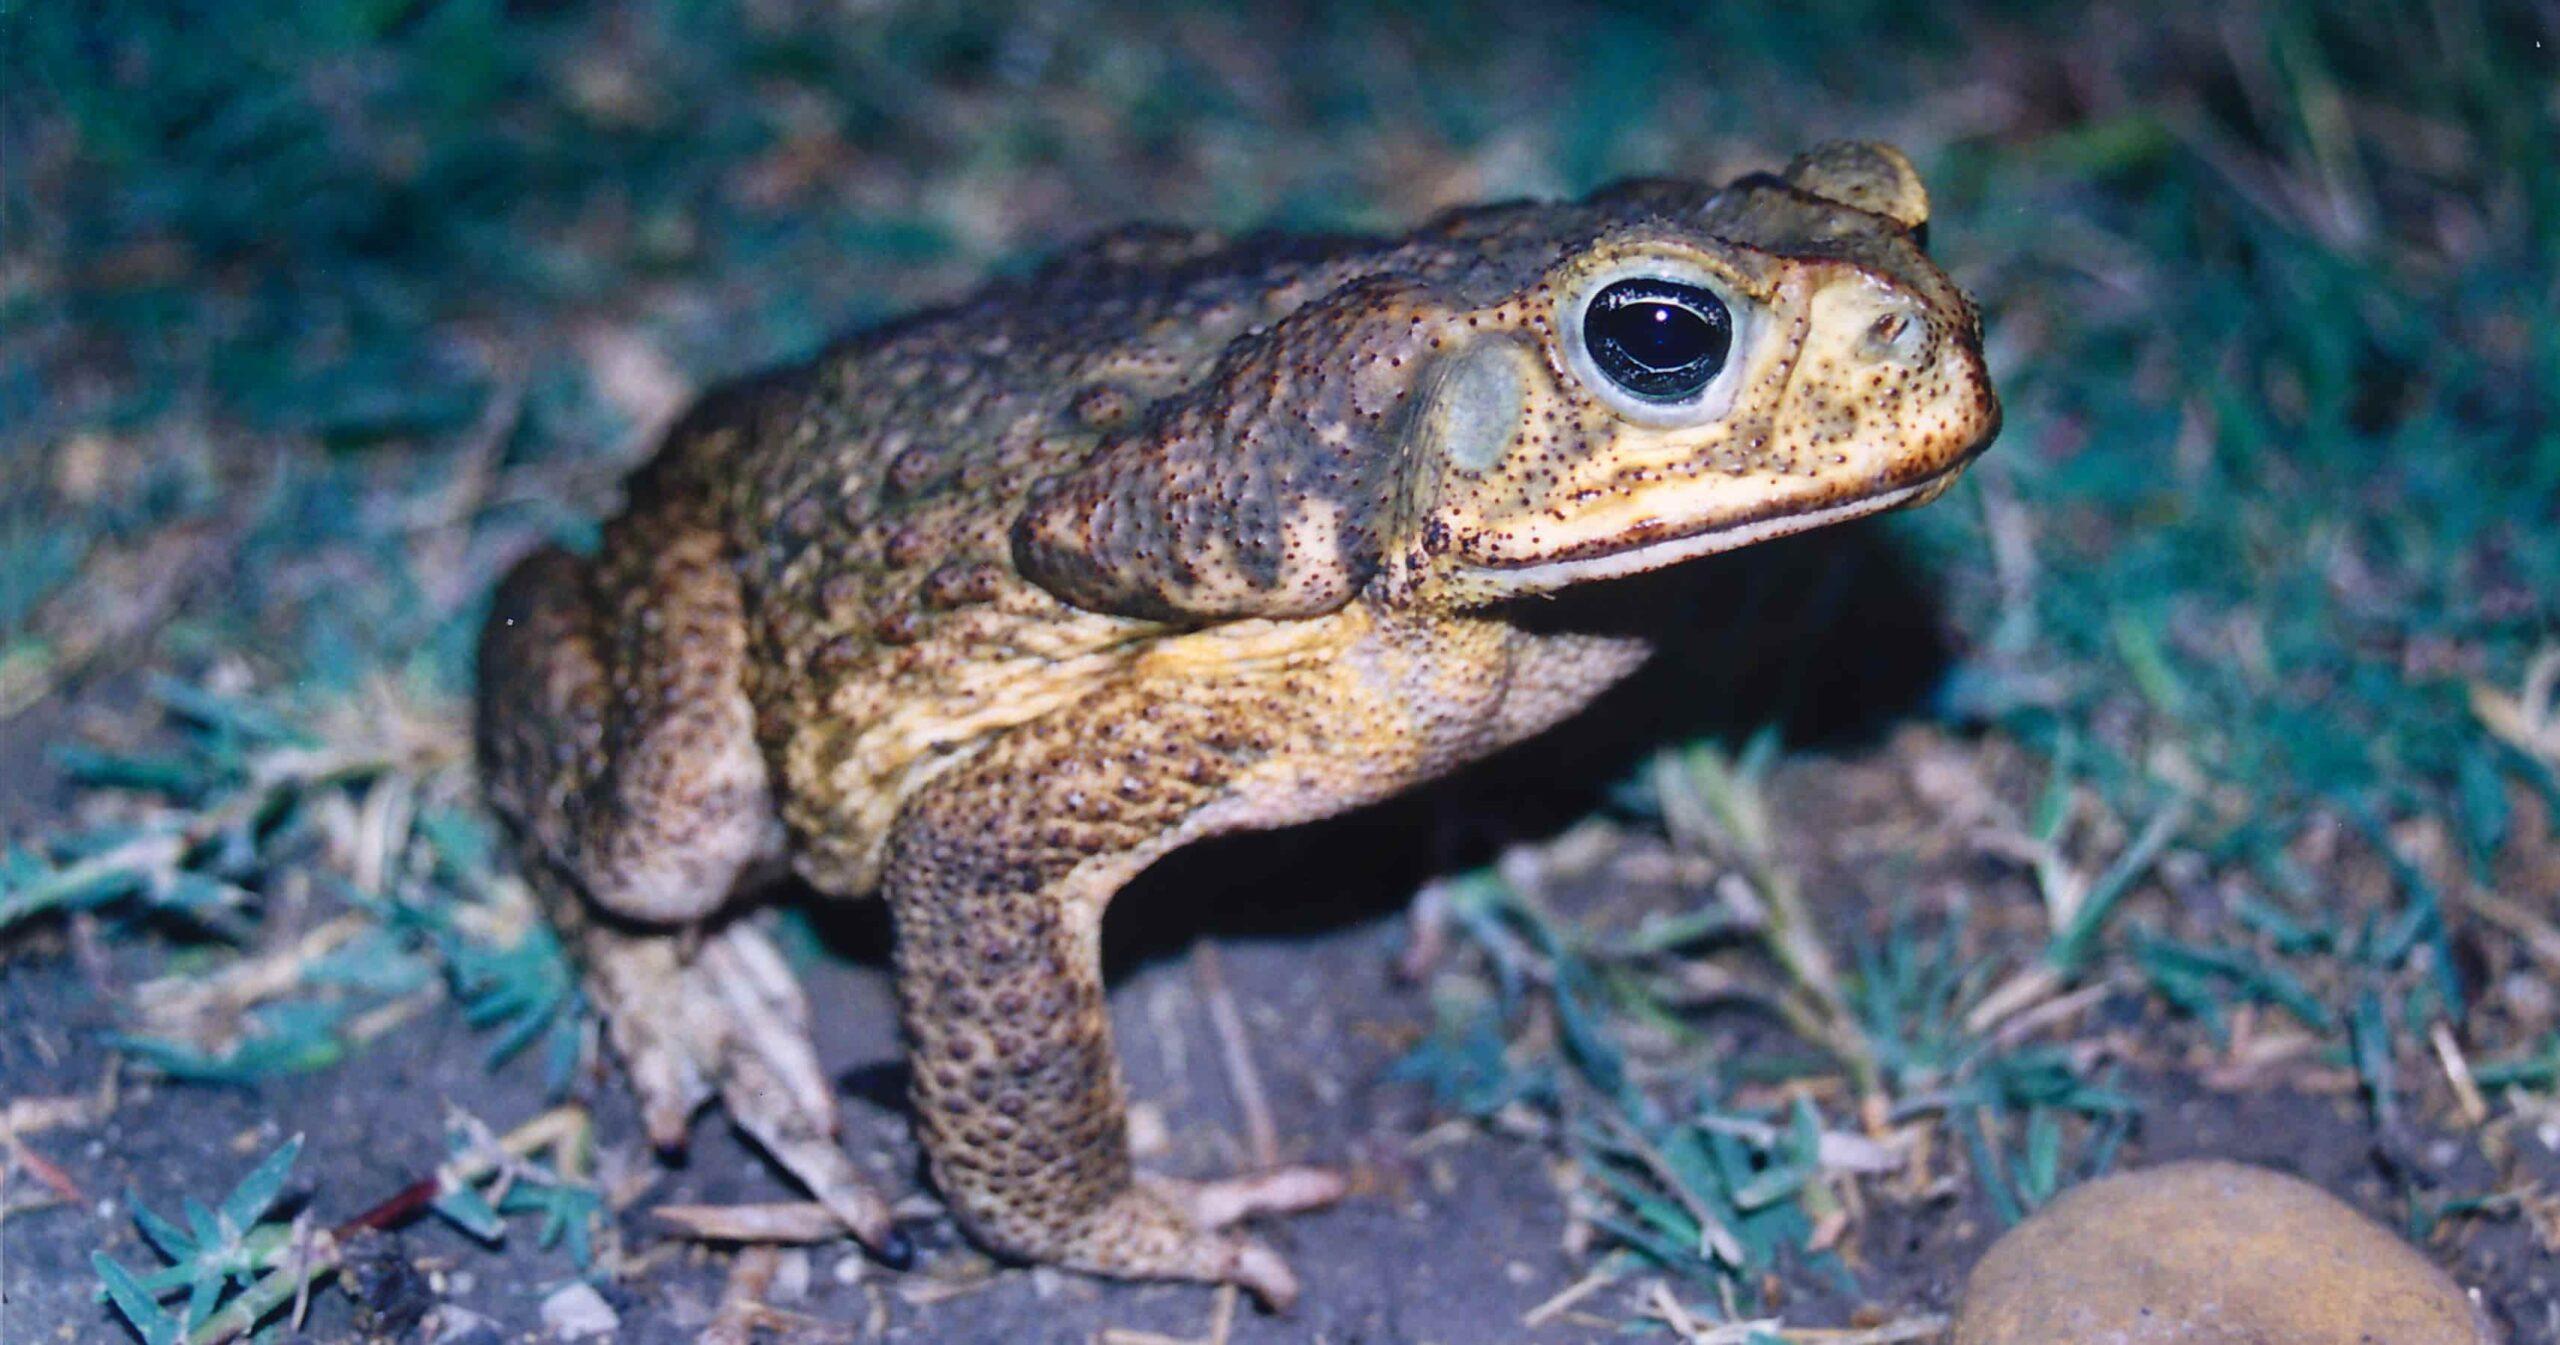 Rhinella horribilis Cane Toad